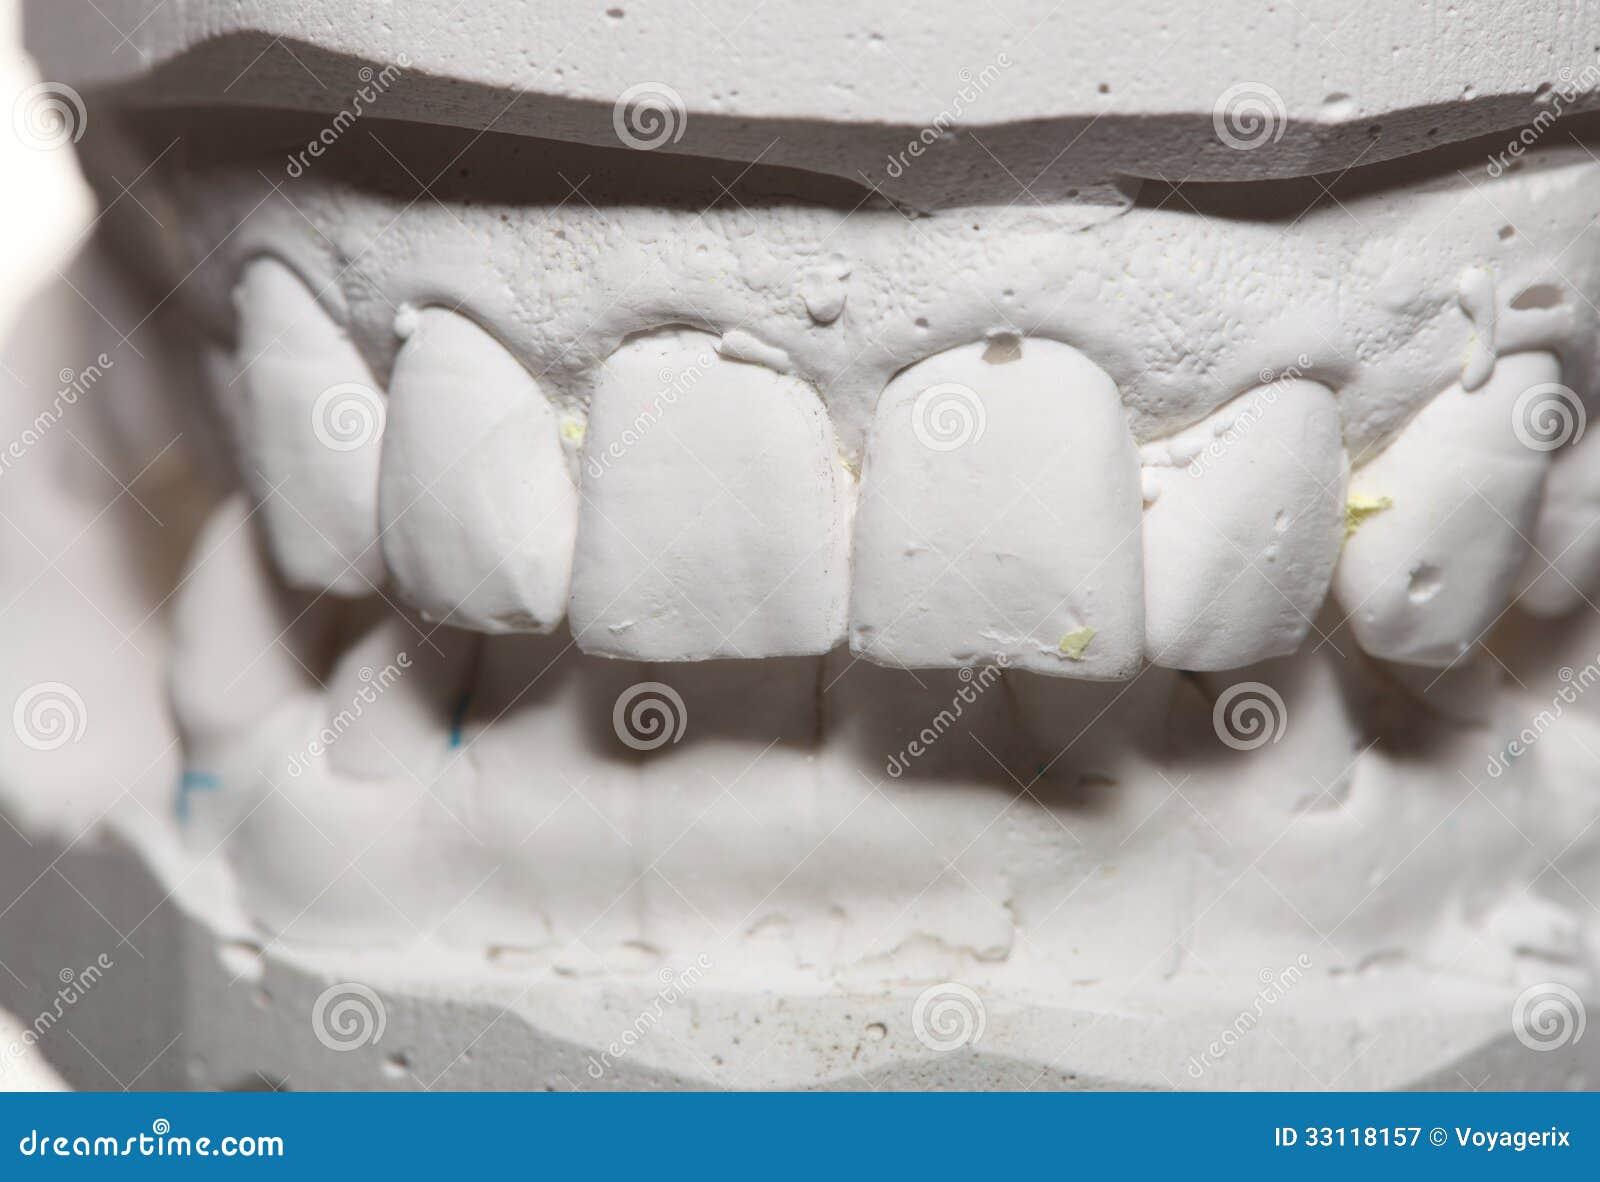 Dental Gypsum Plaster : Dental gypsum model mould of teeth in plaster stock image